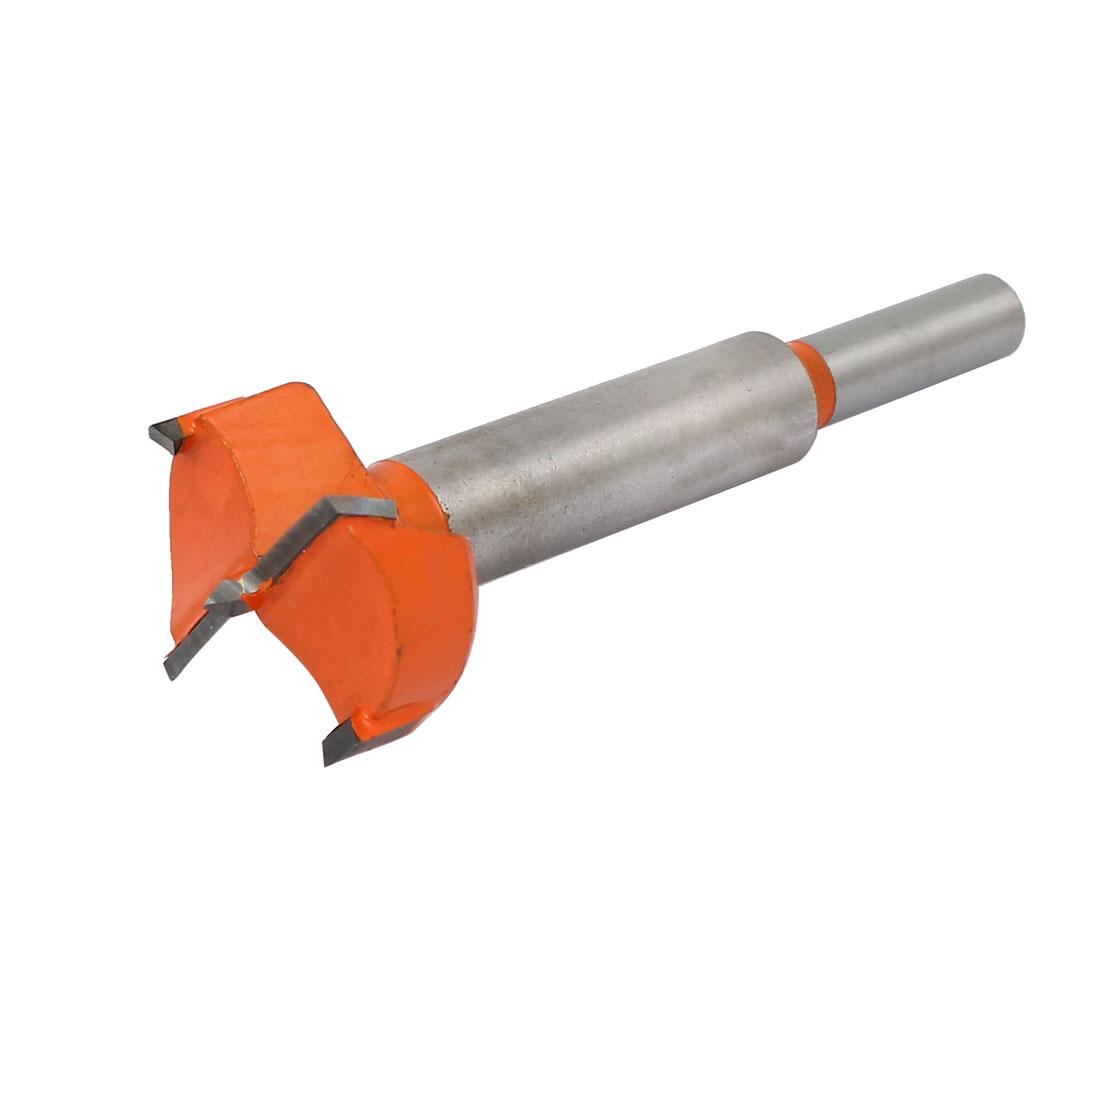 30mm Dia Carbide Tip Wood Drilling Cutting Hinge Boring Bit Drill Tool Orange